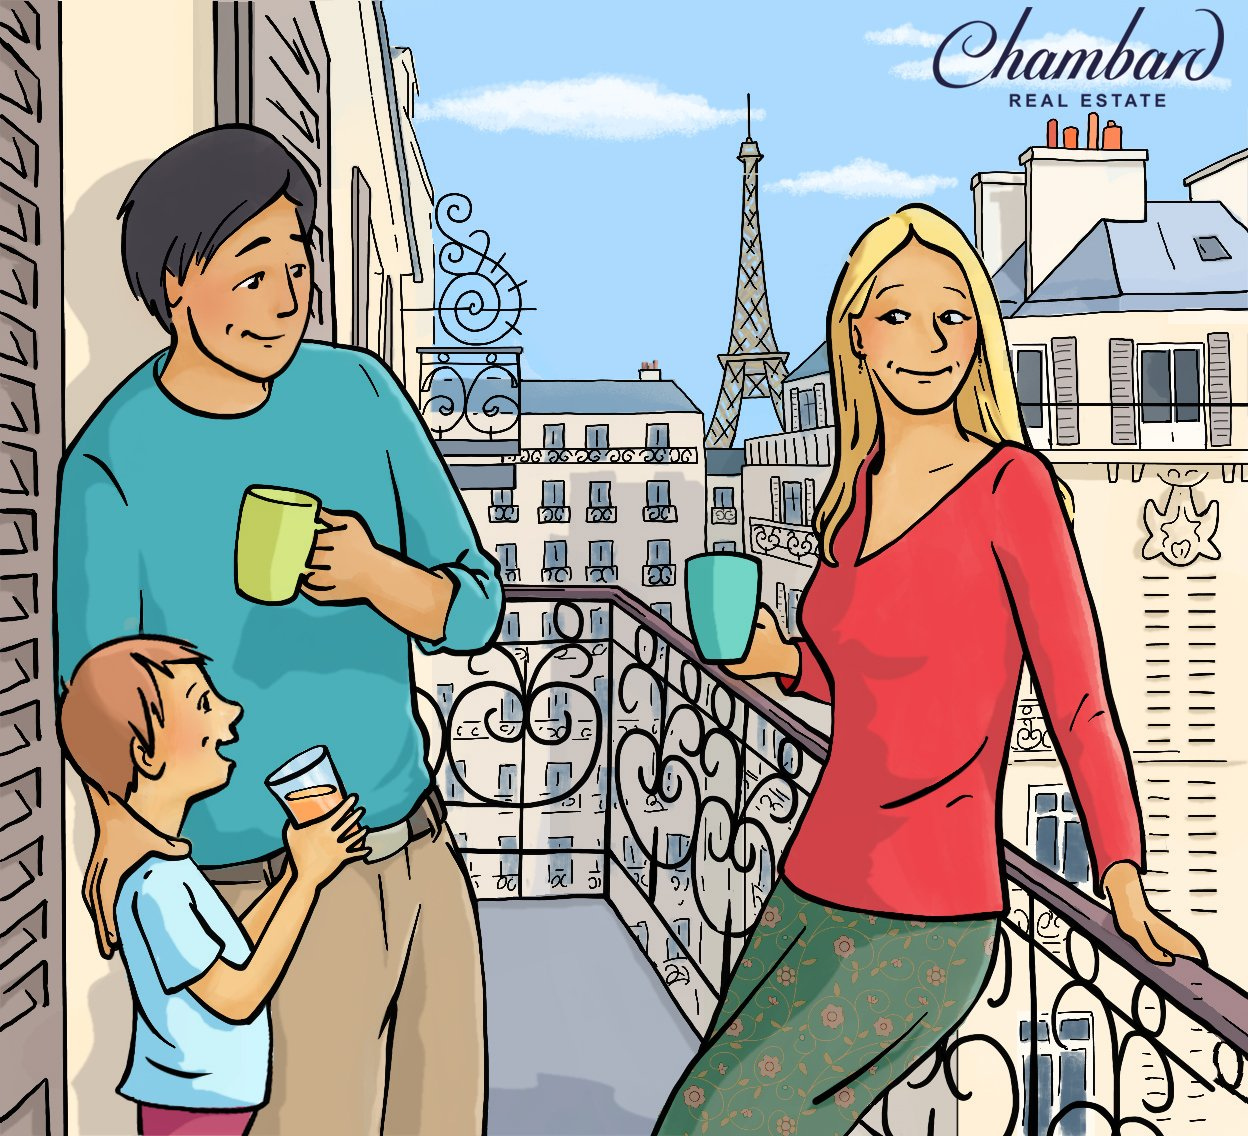 Chambard Real Estate